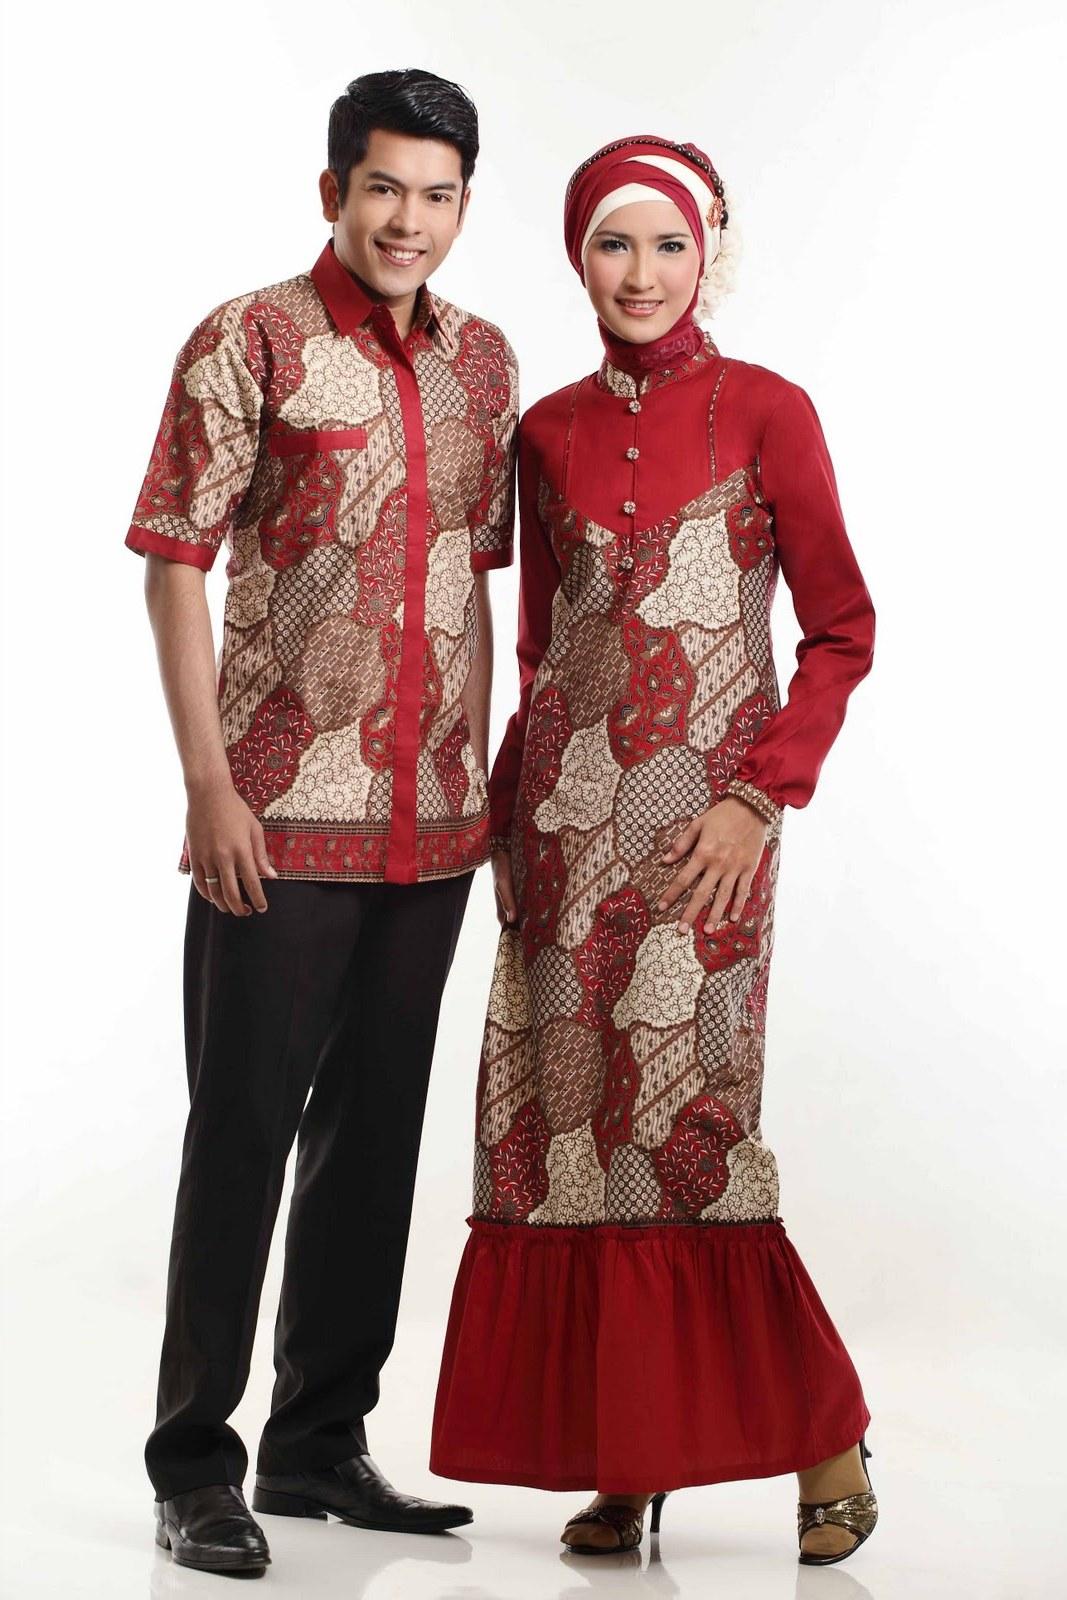 Bentuk Gambar Baju Lebaran Terbaru Etdg Bintang anda Trend Model Baju Batik Lebaran Terbaru 2013